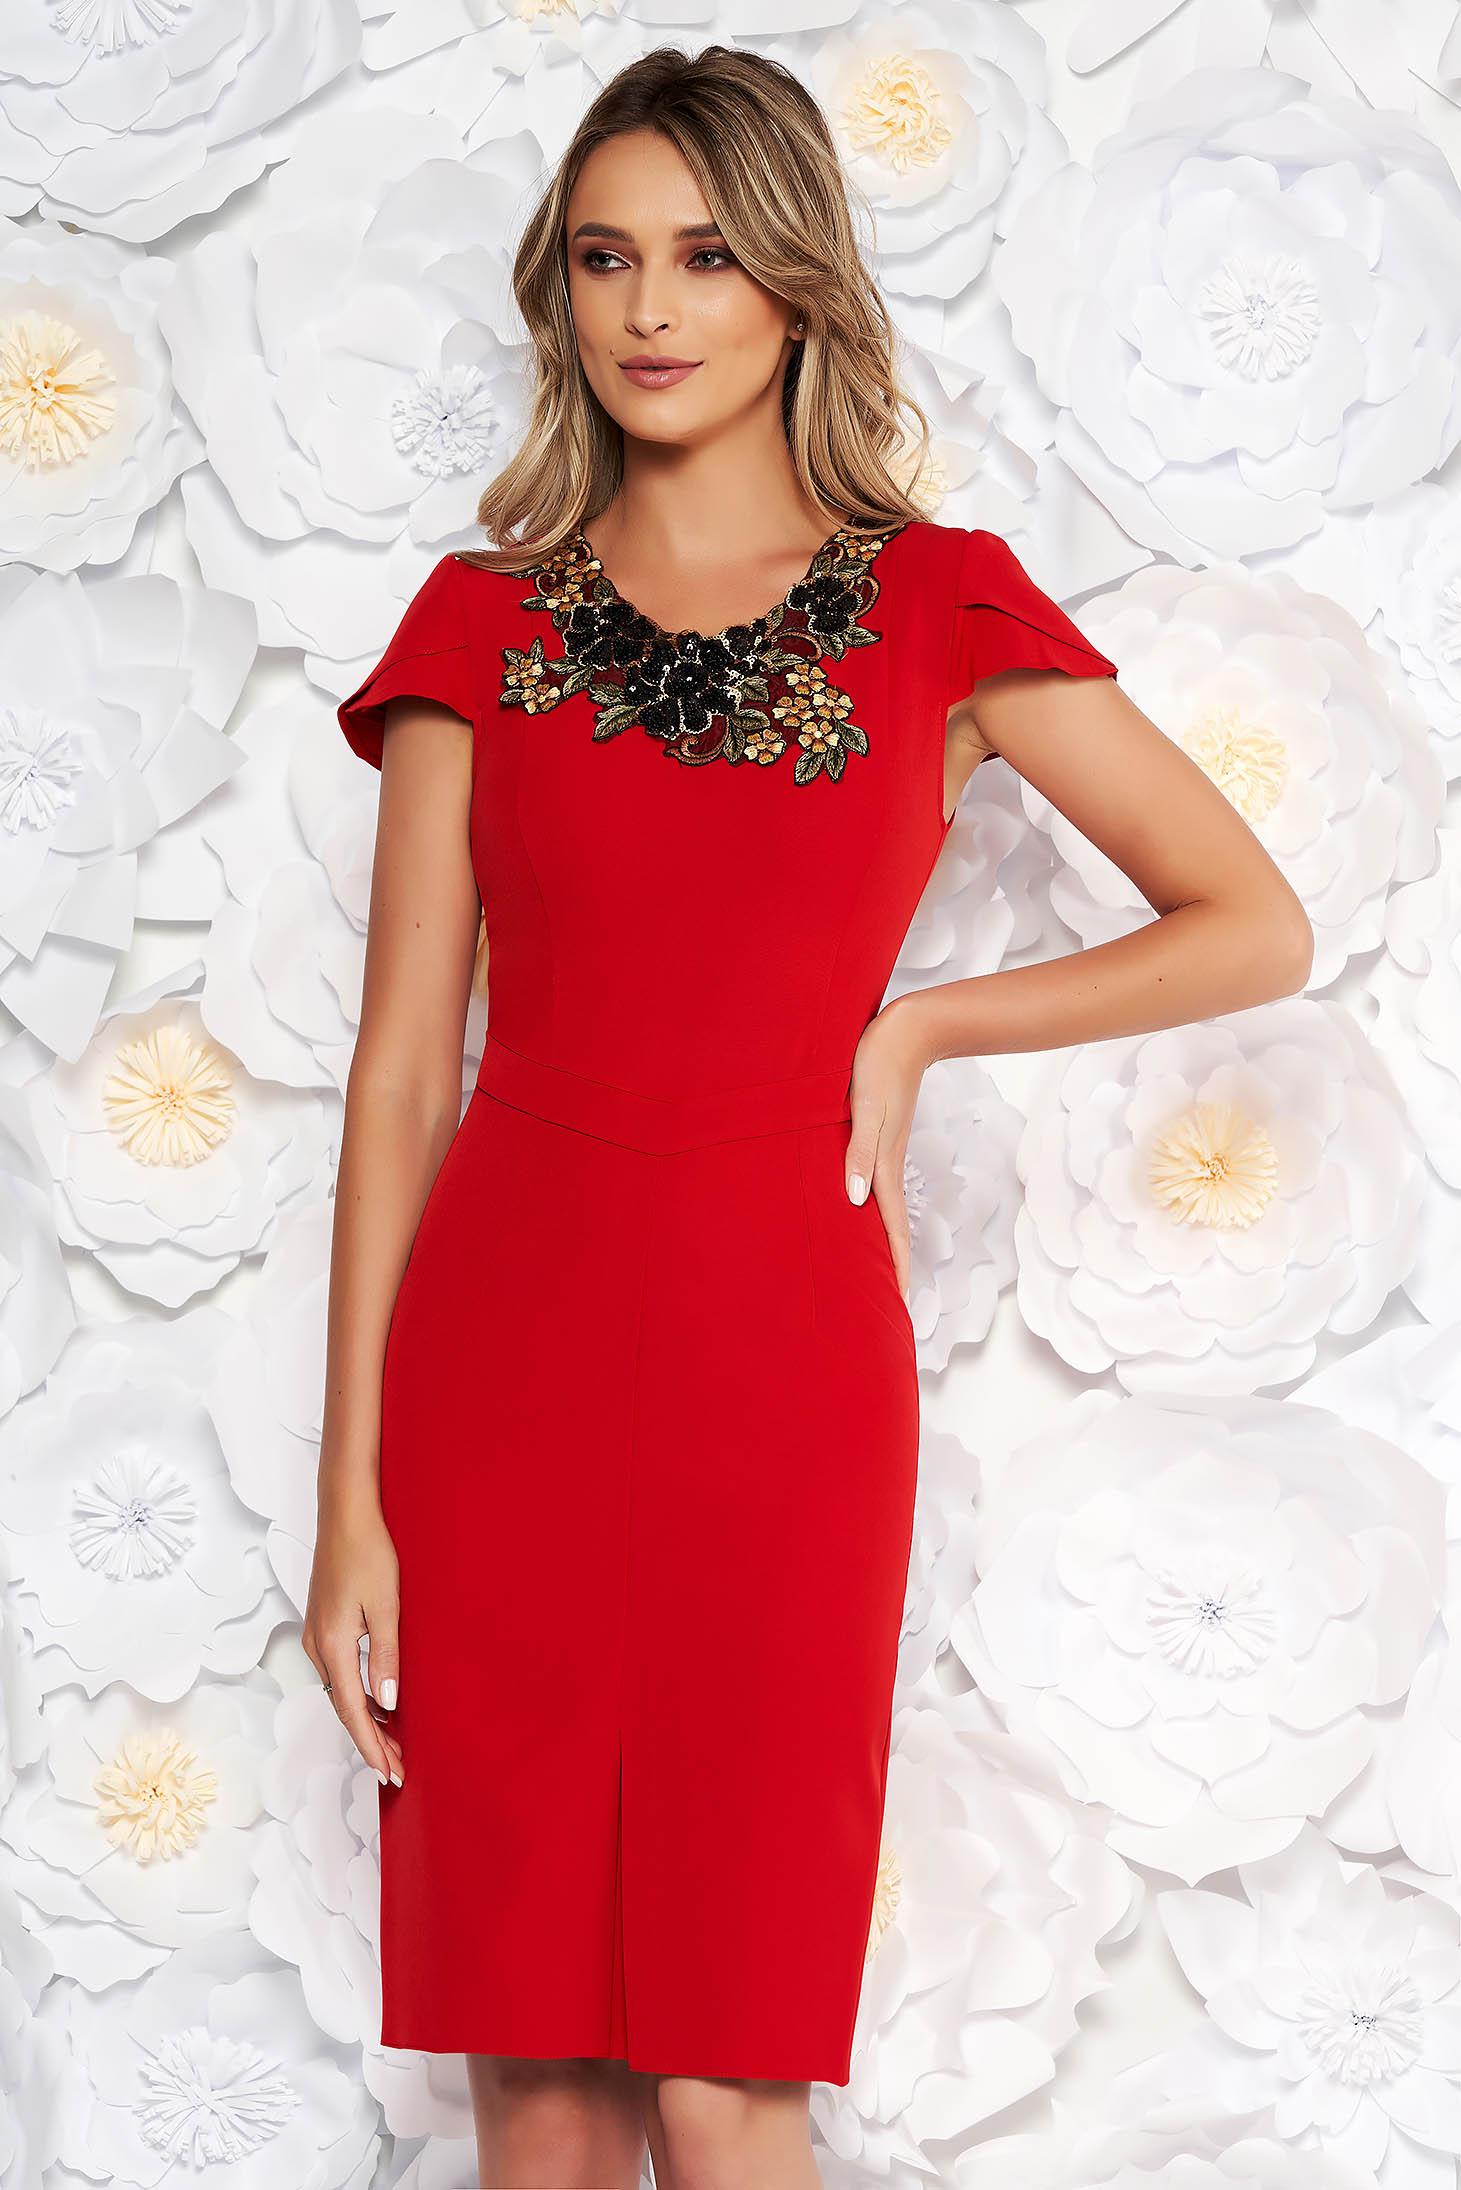 Red elegant pencil dress slightly elastic fabric handmade applications